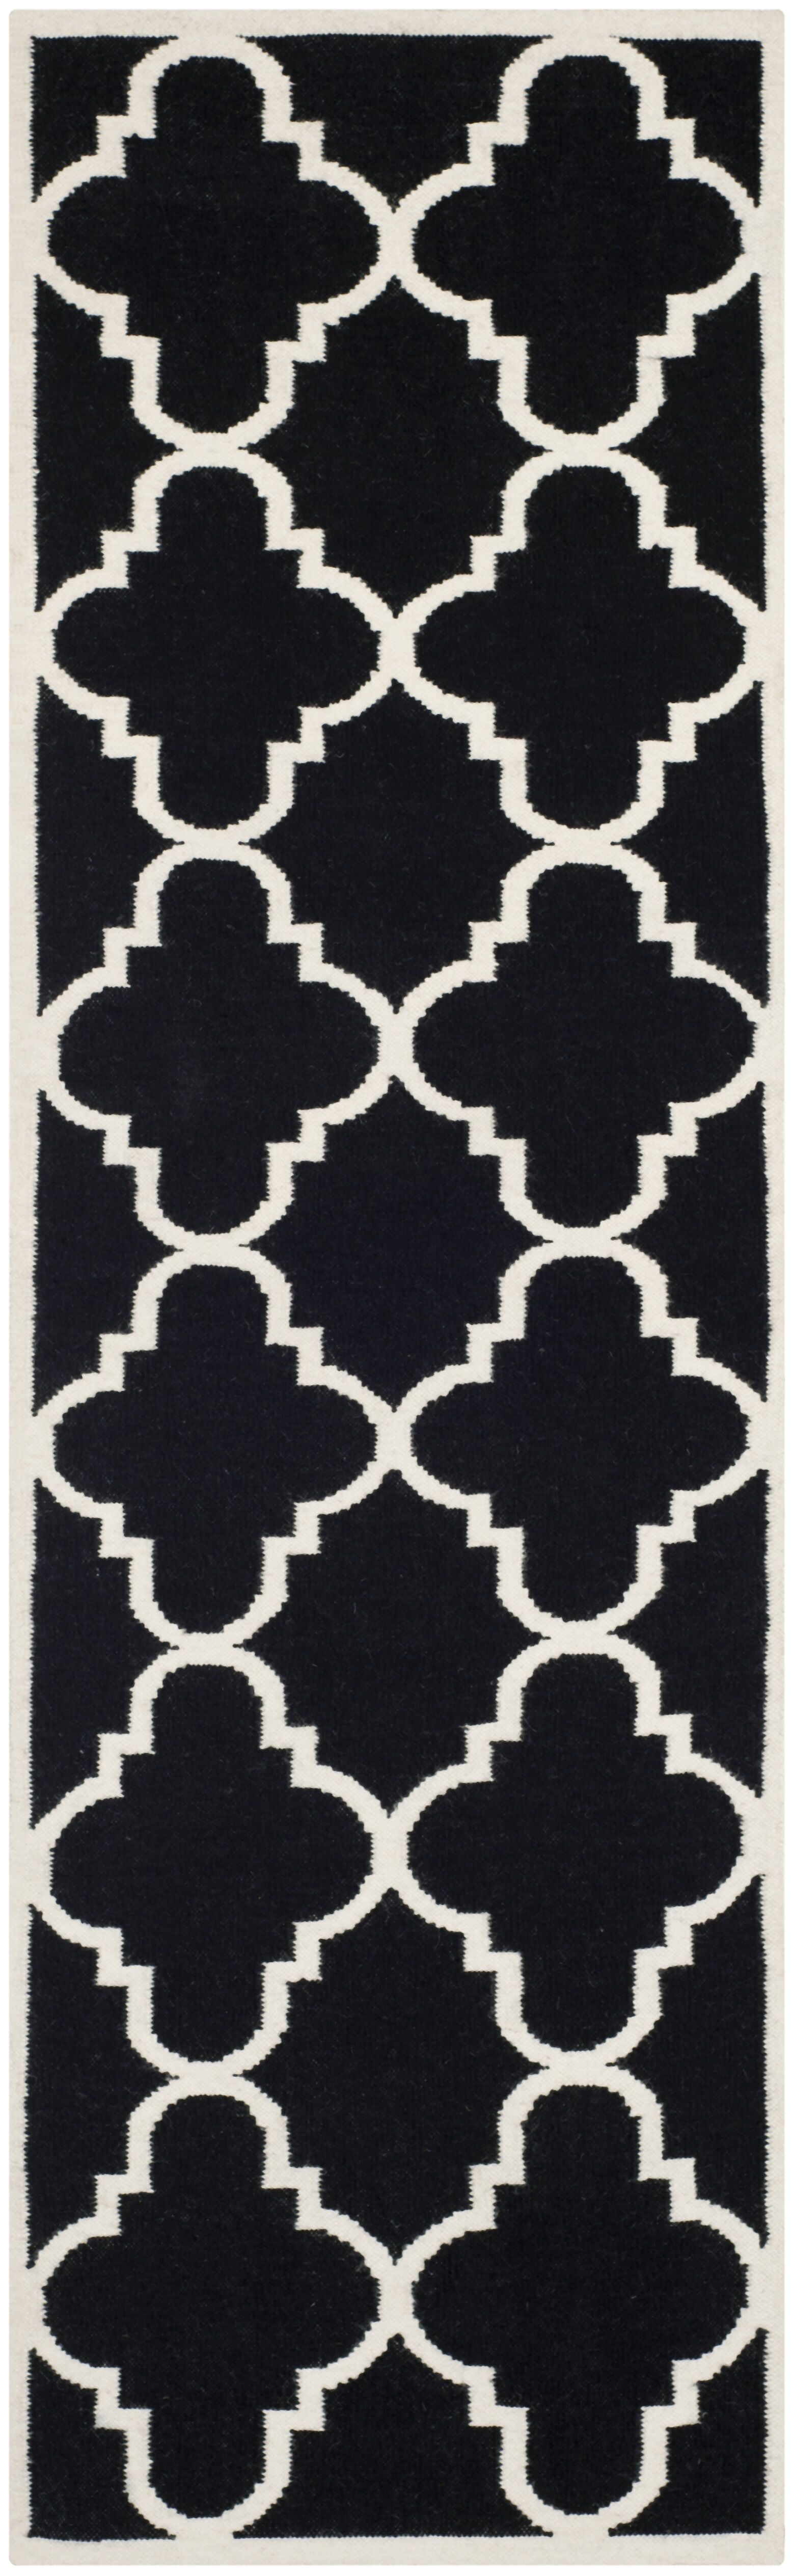 Dhurries Hand-Woven Wool Black/Ivory Area Rug Rug Size: Runner 2'6